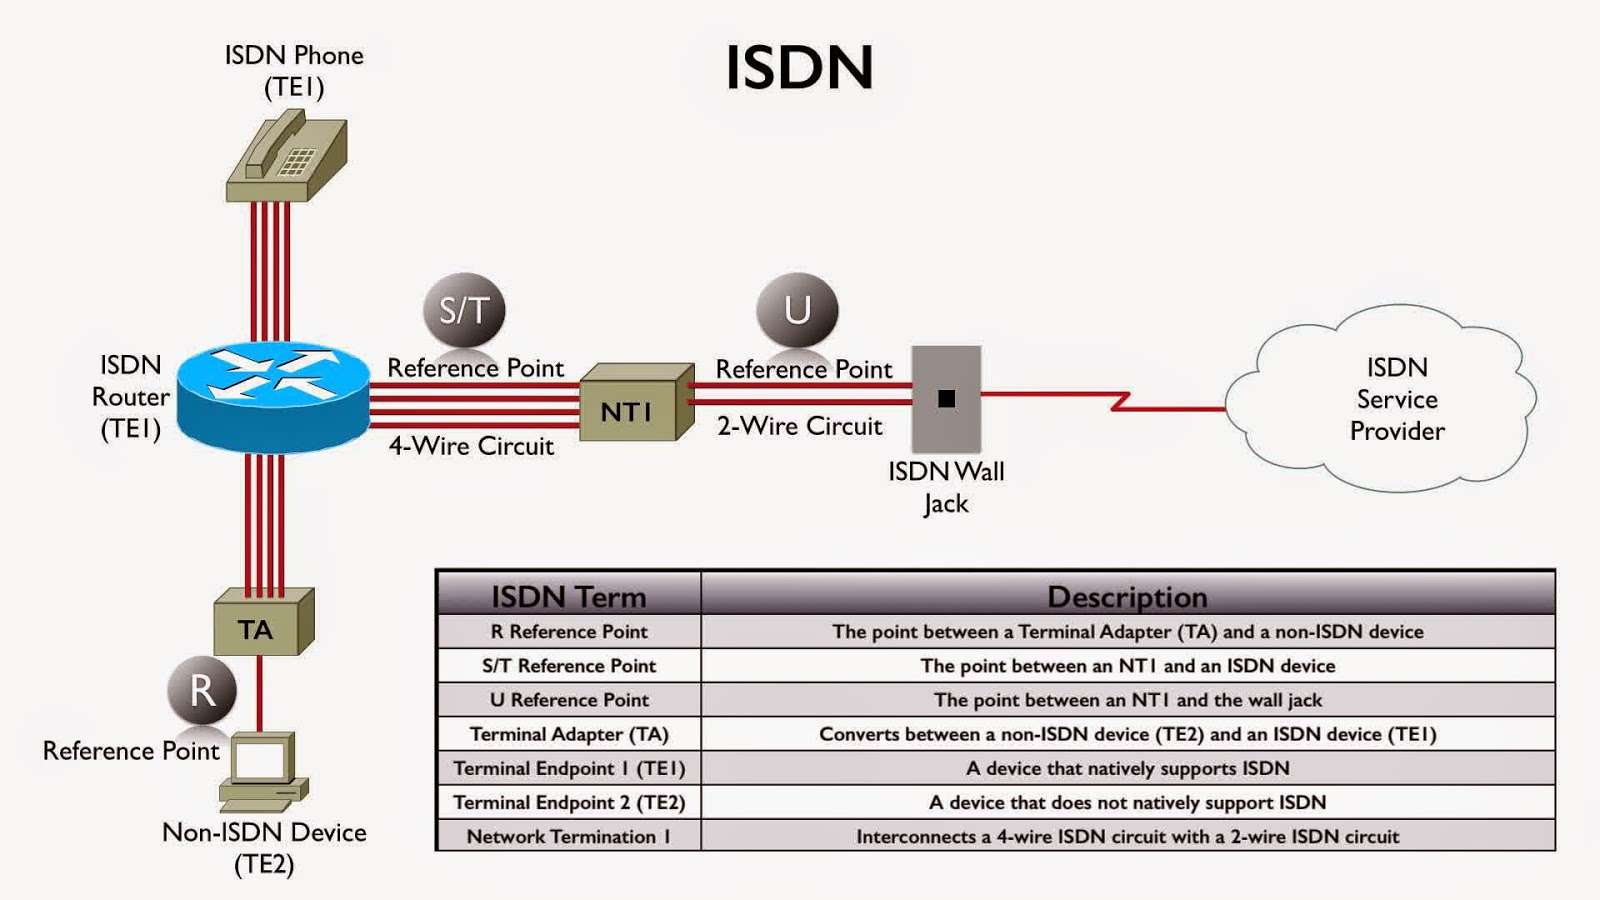 isdn wiring diagram wiring diagram third level ethernet wiring diagram for isdn [ 1600 x 900 Pixel ]